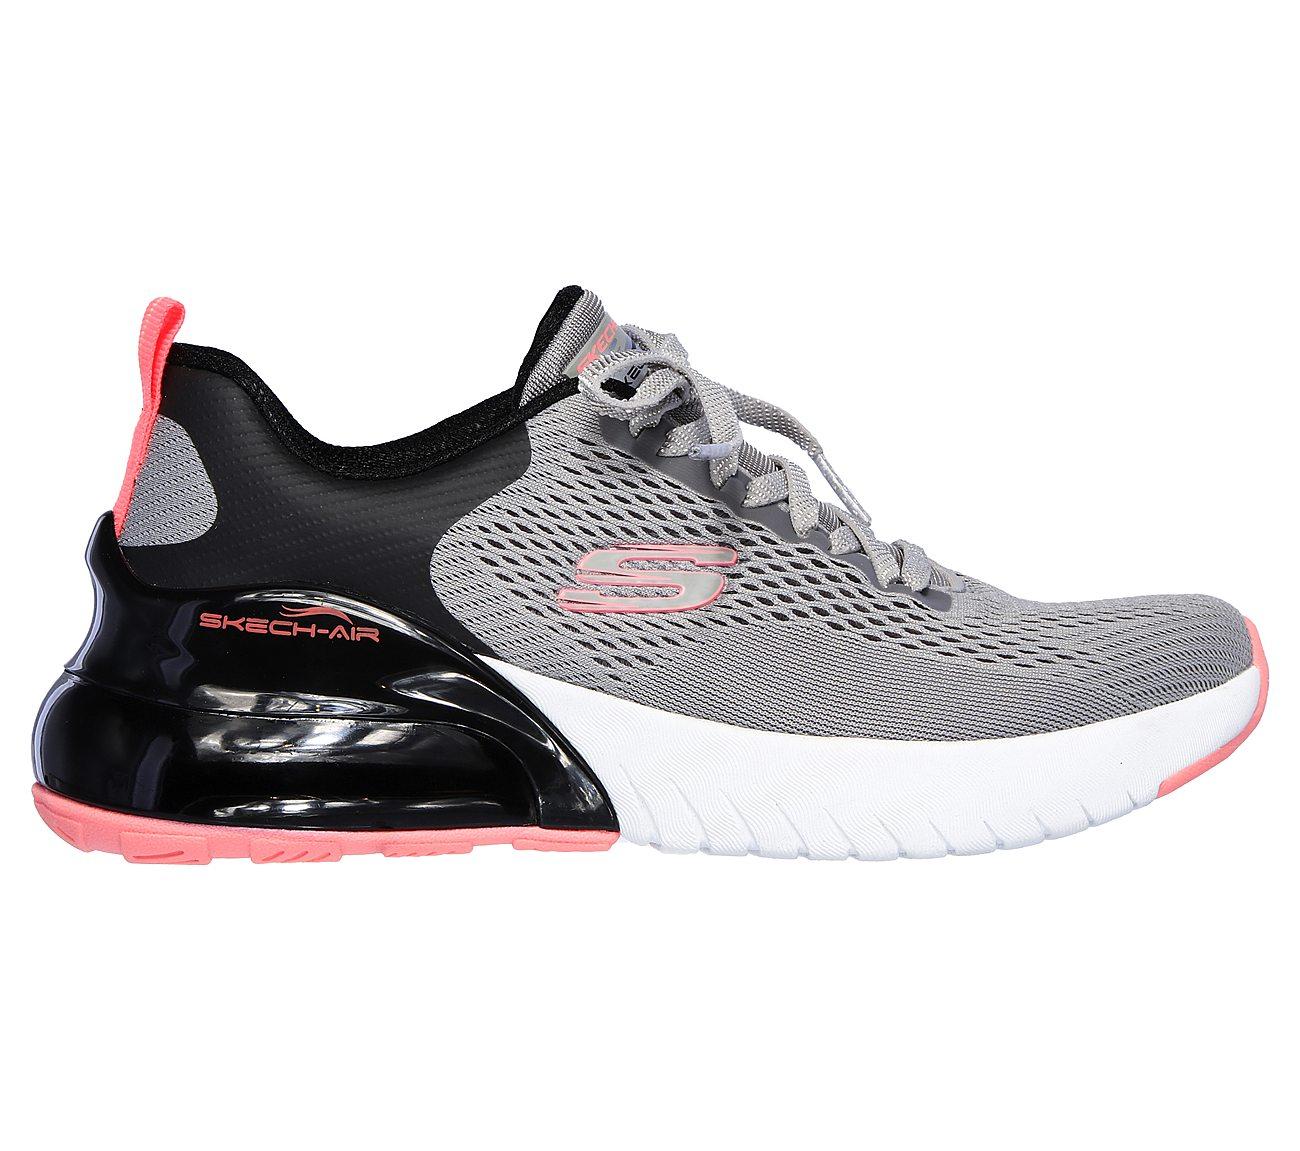 Skechers Skech Air Schuhe Bestellen Skechers Schuhe